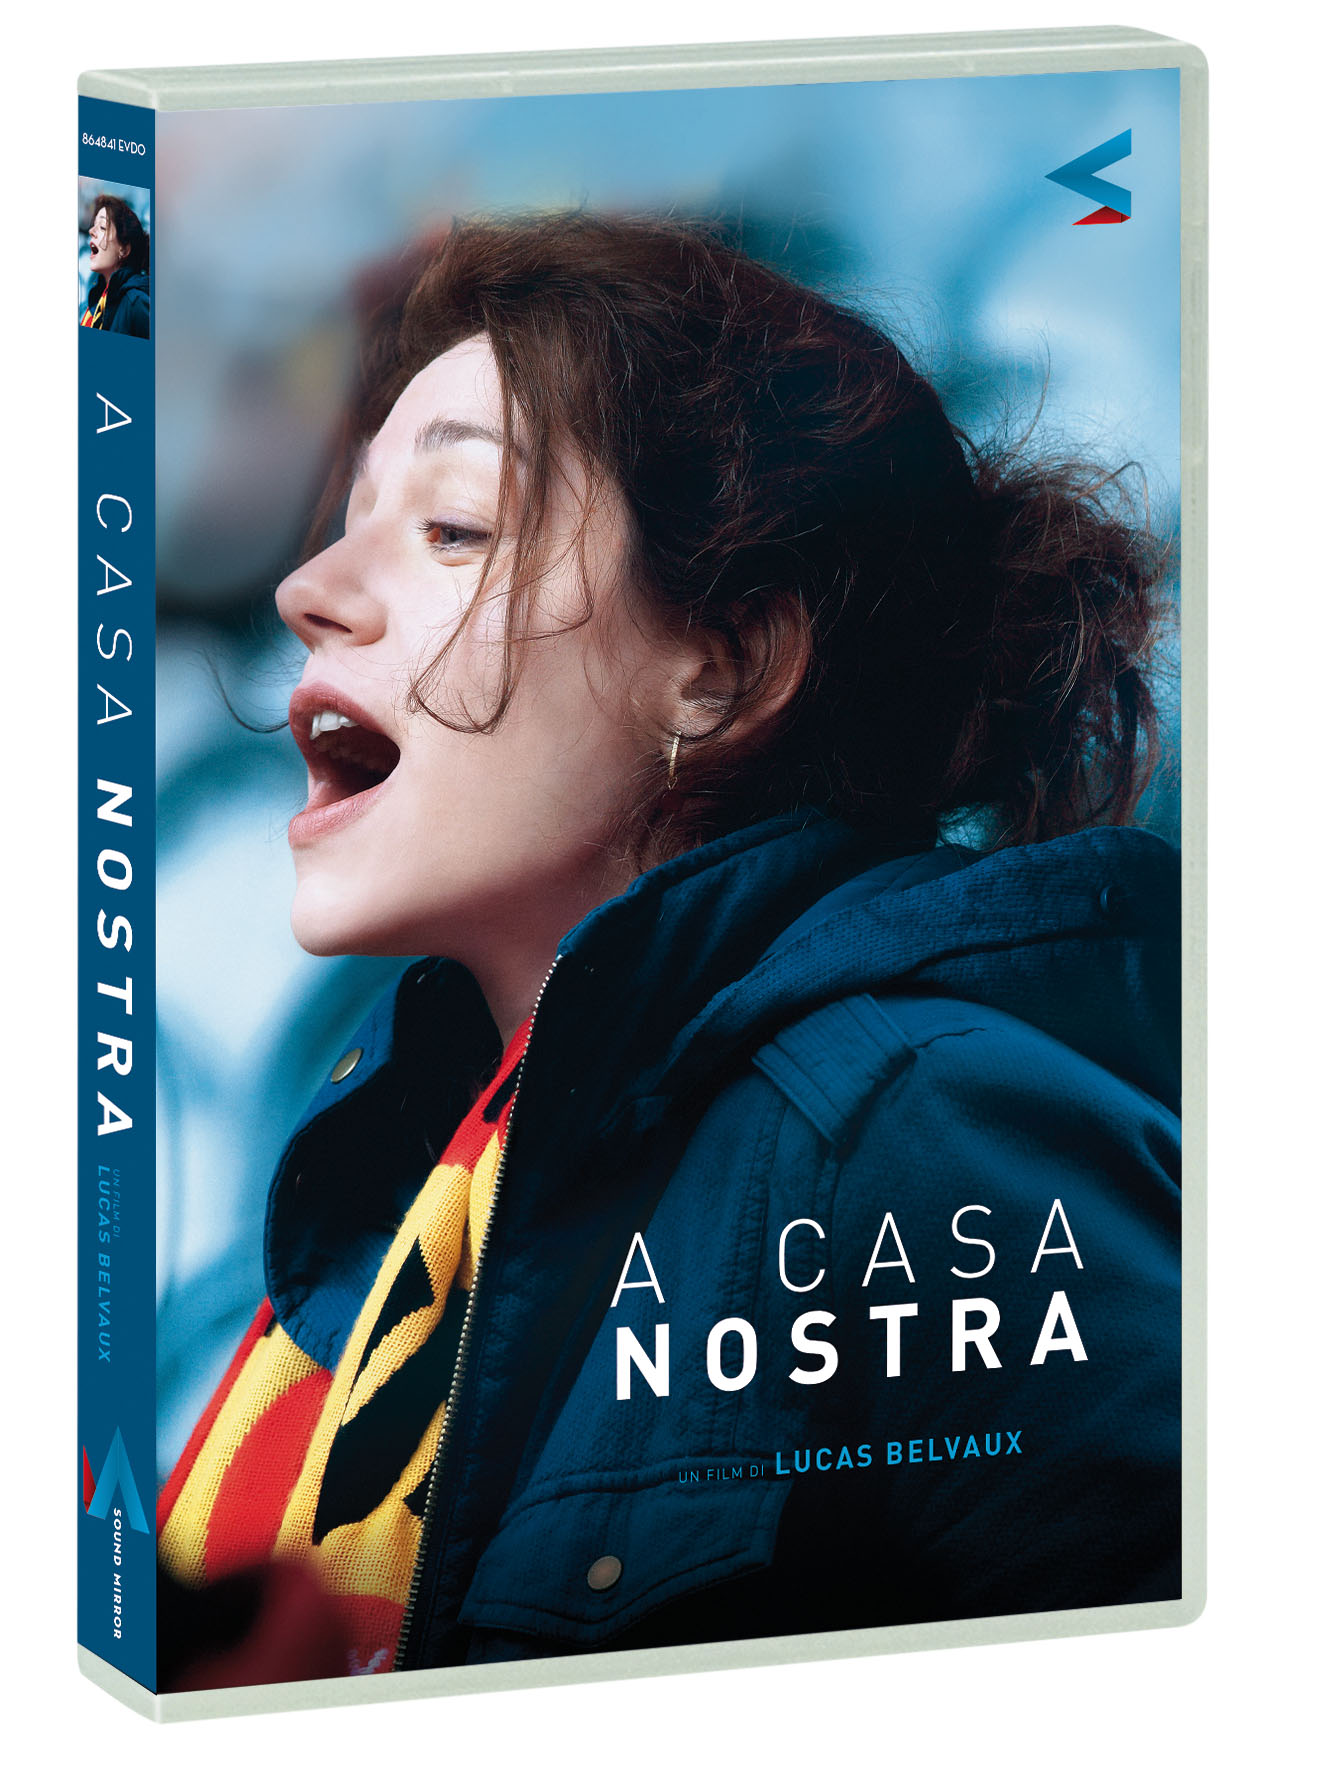 A CASA NOSTRA - 2017 (DVD)